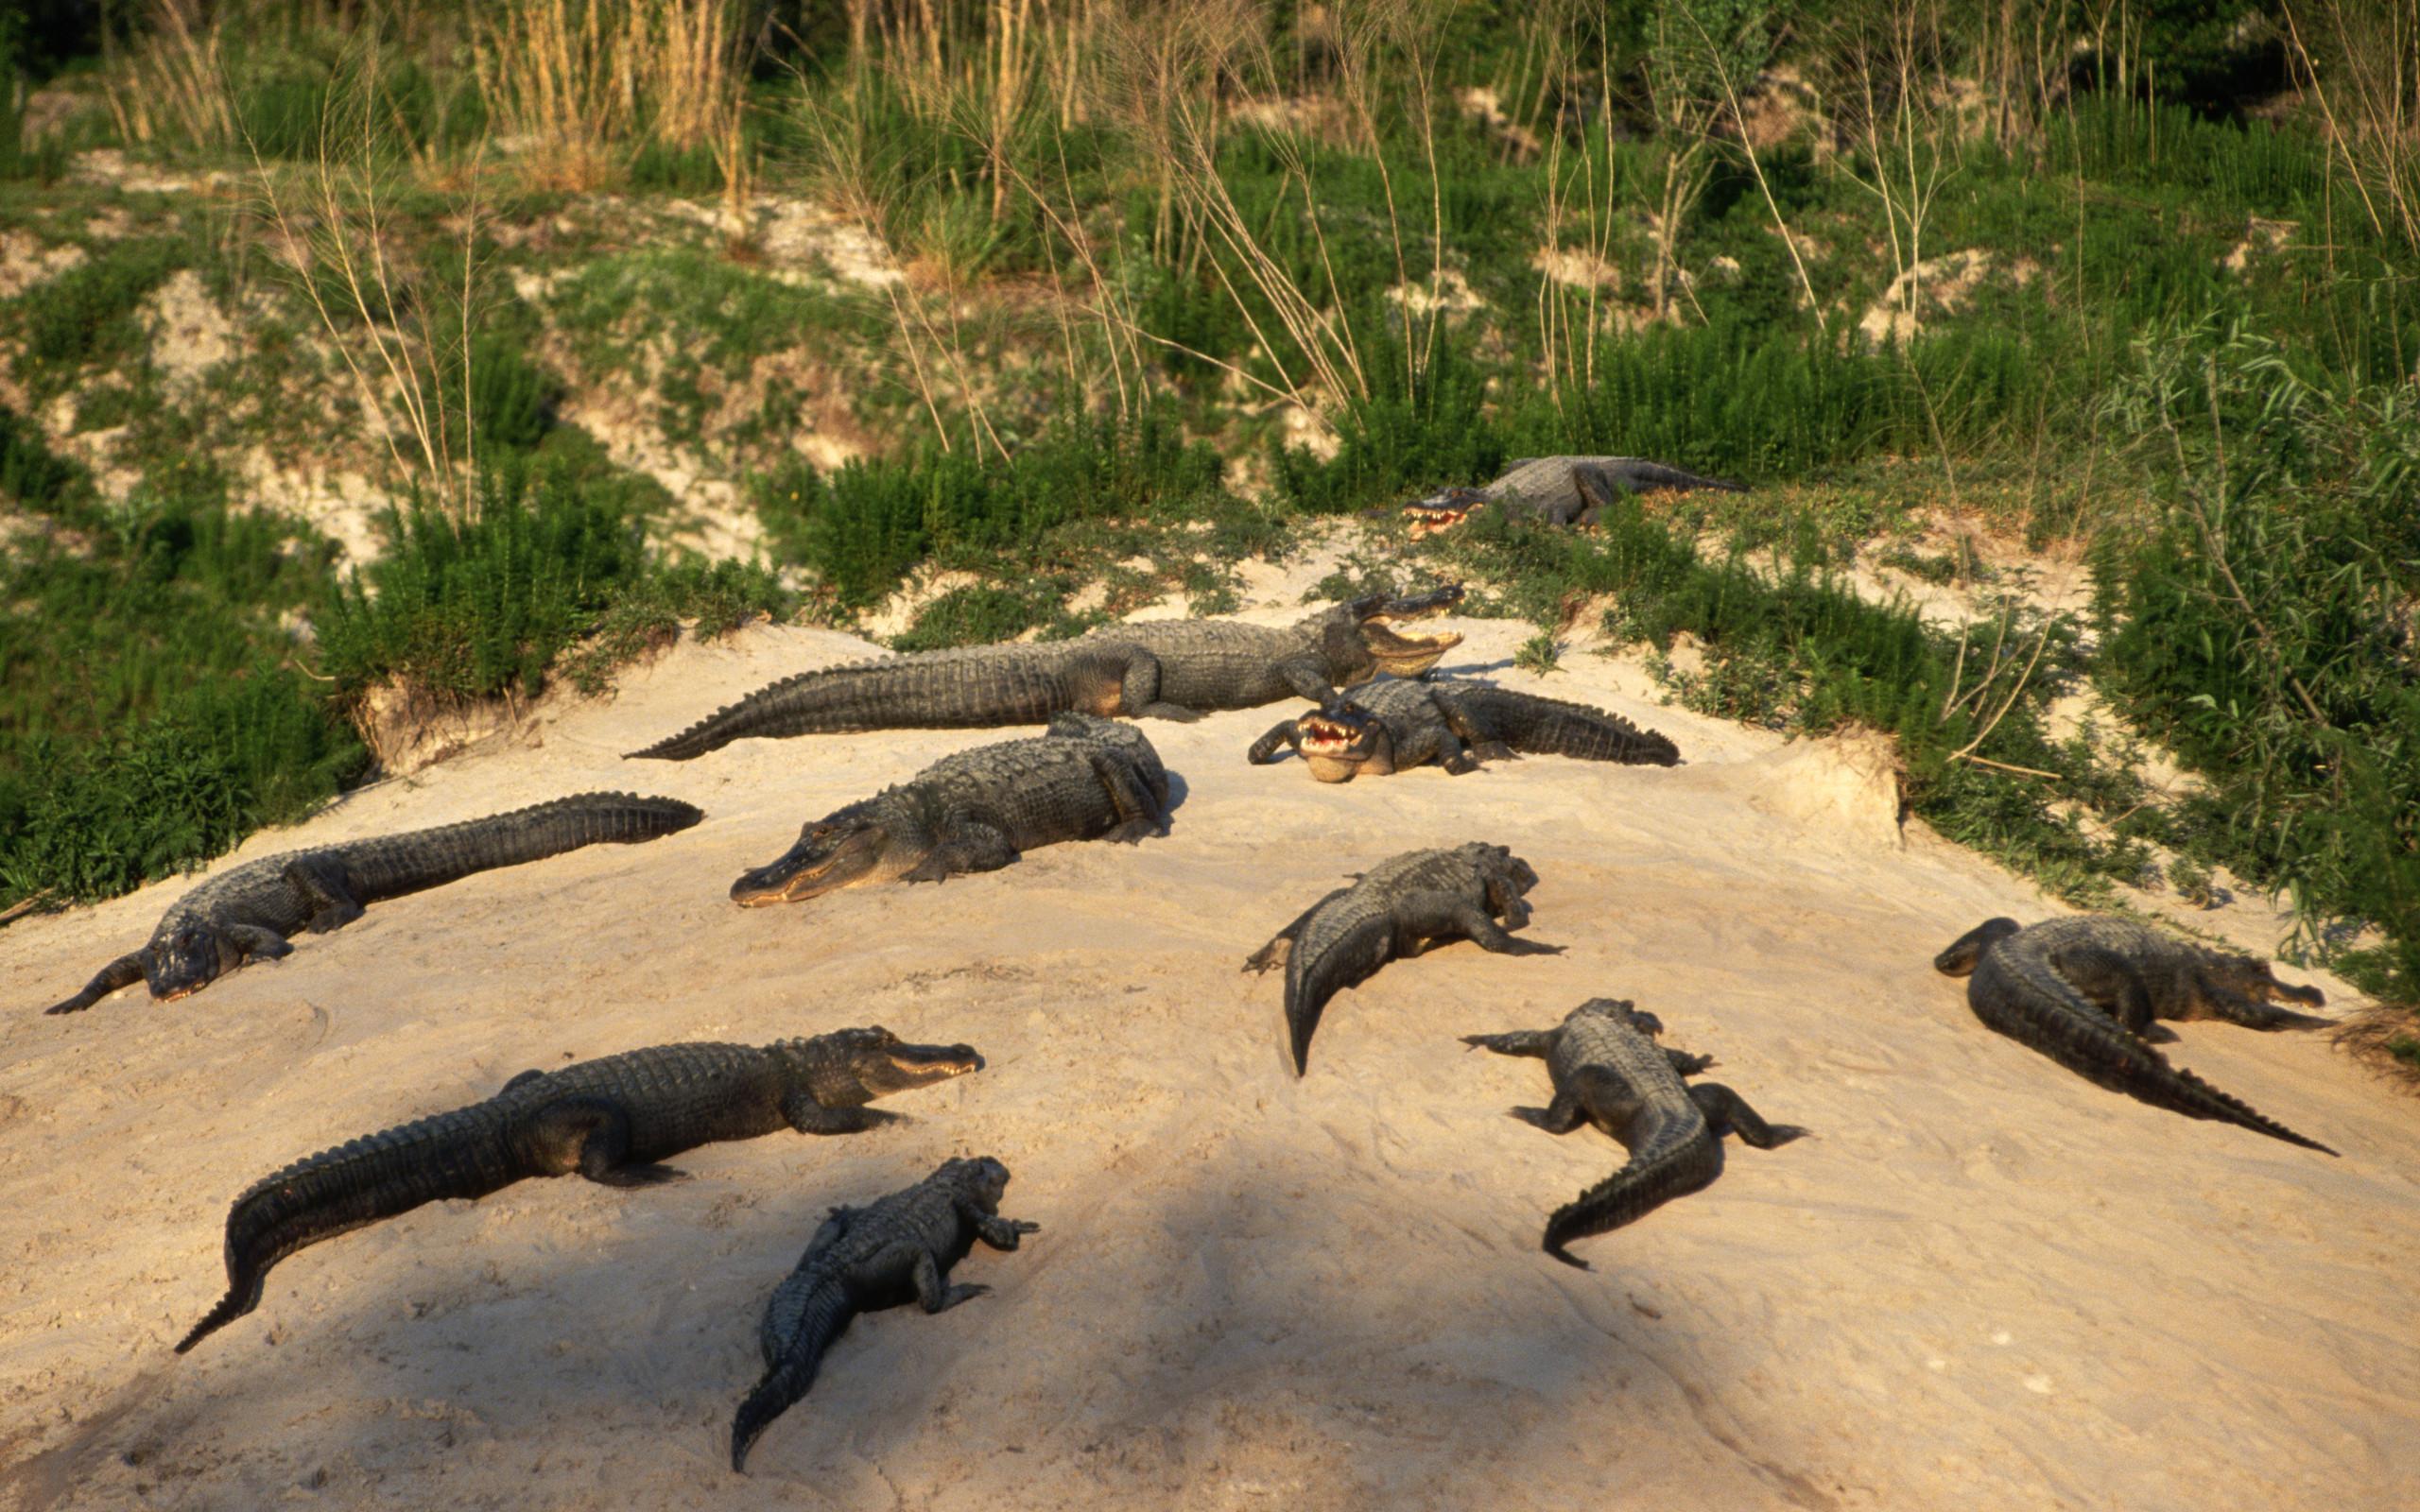 Crocodile HD Wallpaper | Background Image | 2560x1600 | ID ...